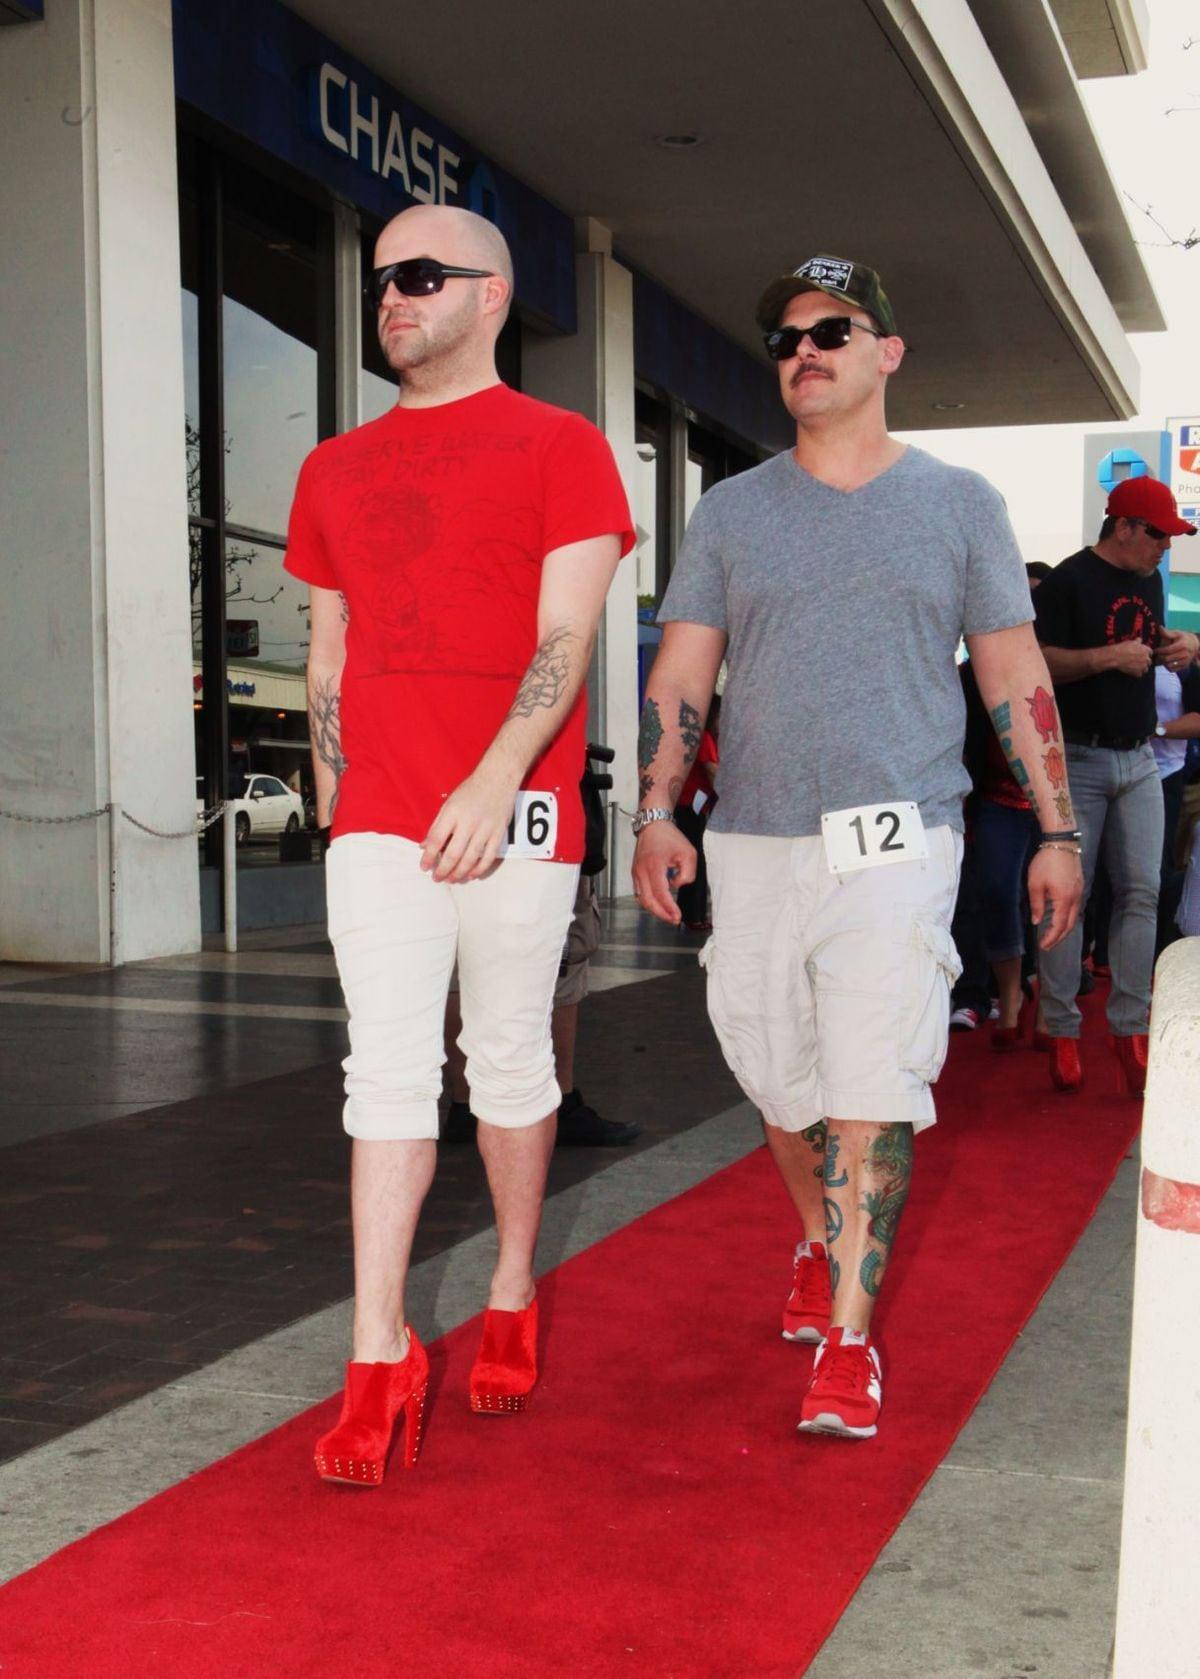 Red High Heels Walk